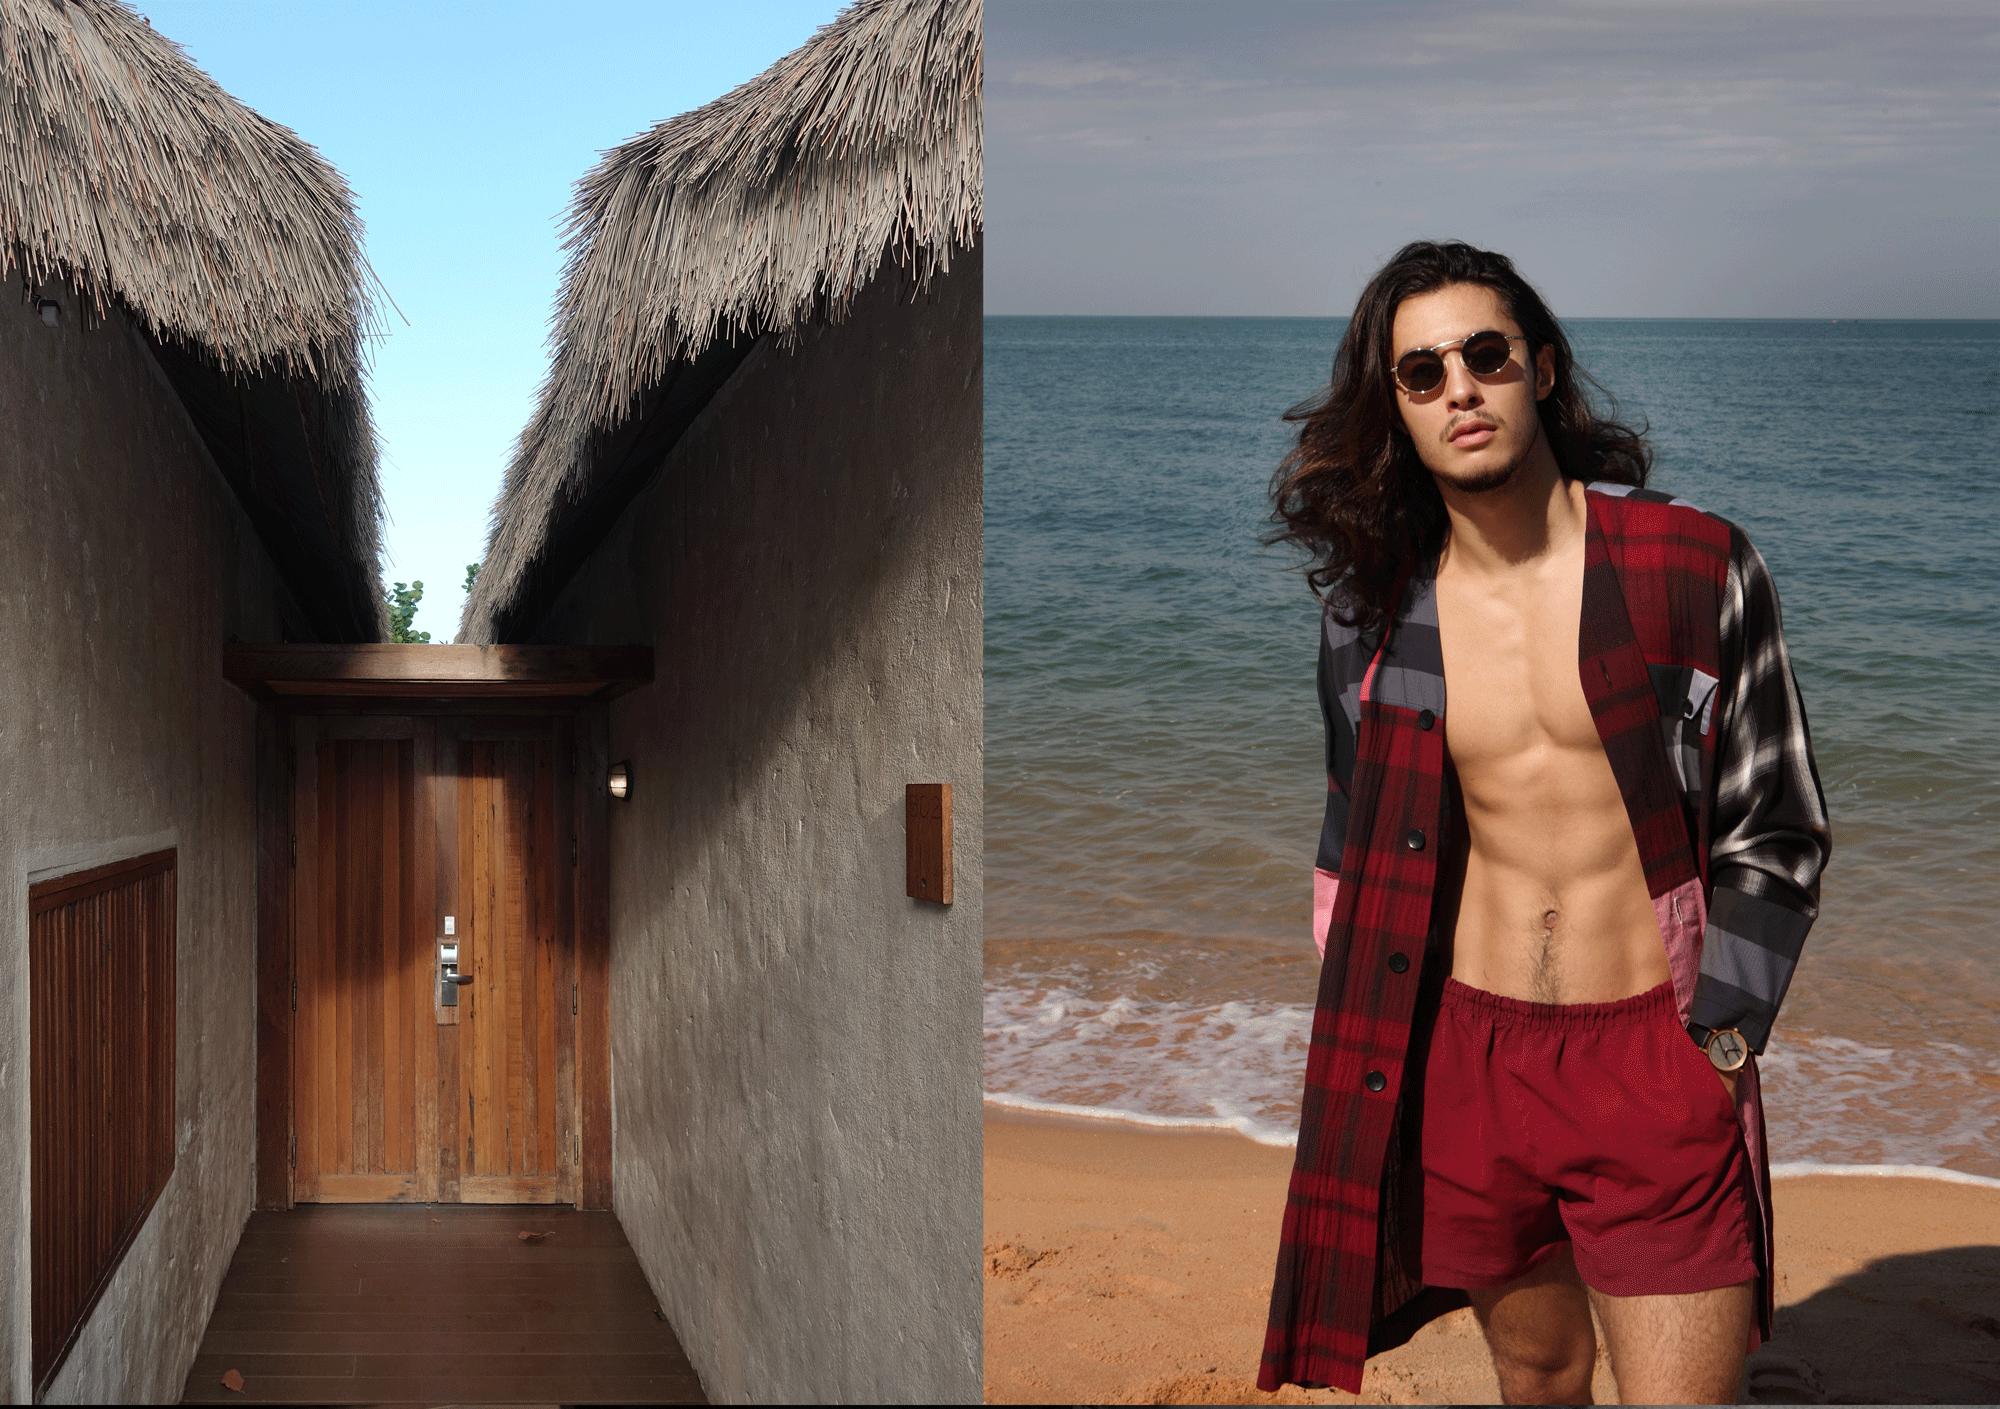 robe : PAINKILLER/ sunglasses : Boston Club / watch : FORREST